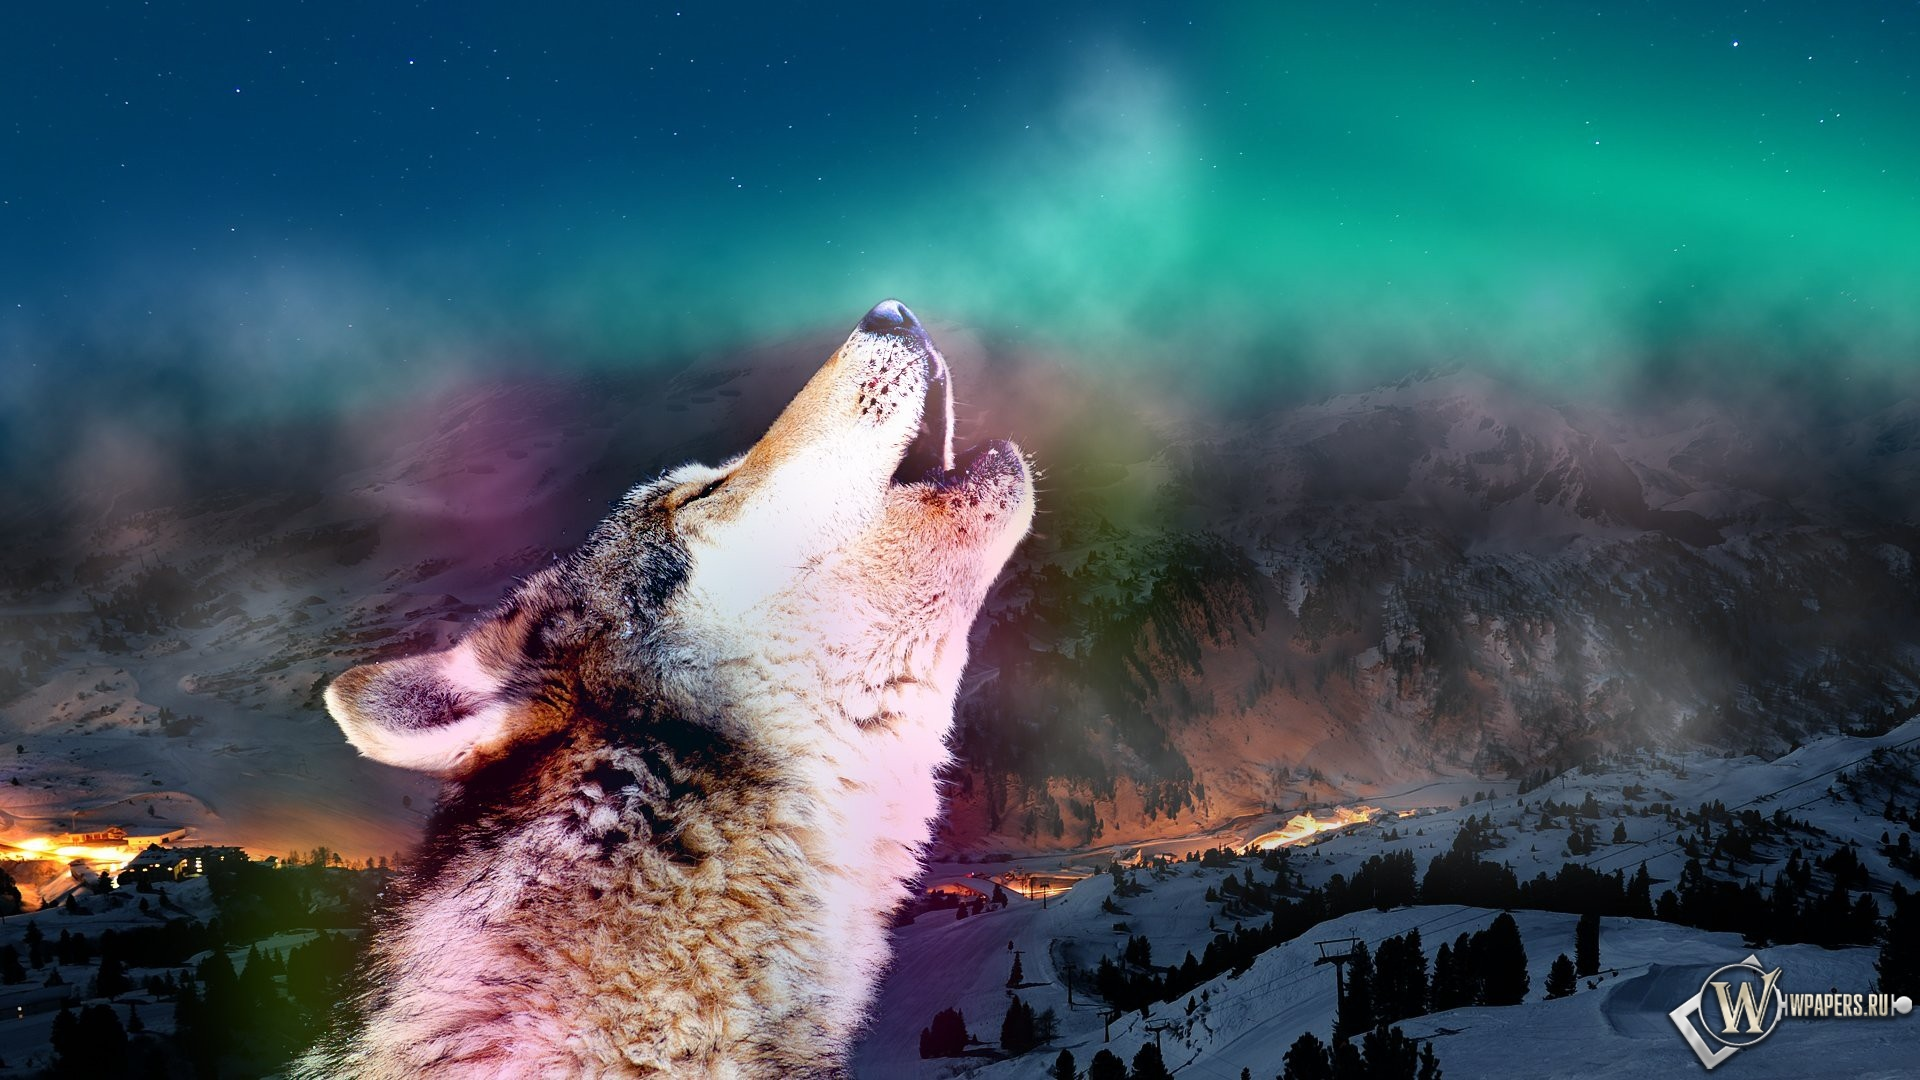 Воющий волк 1920x1080